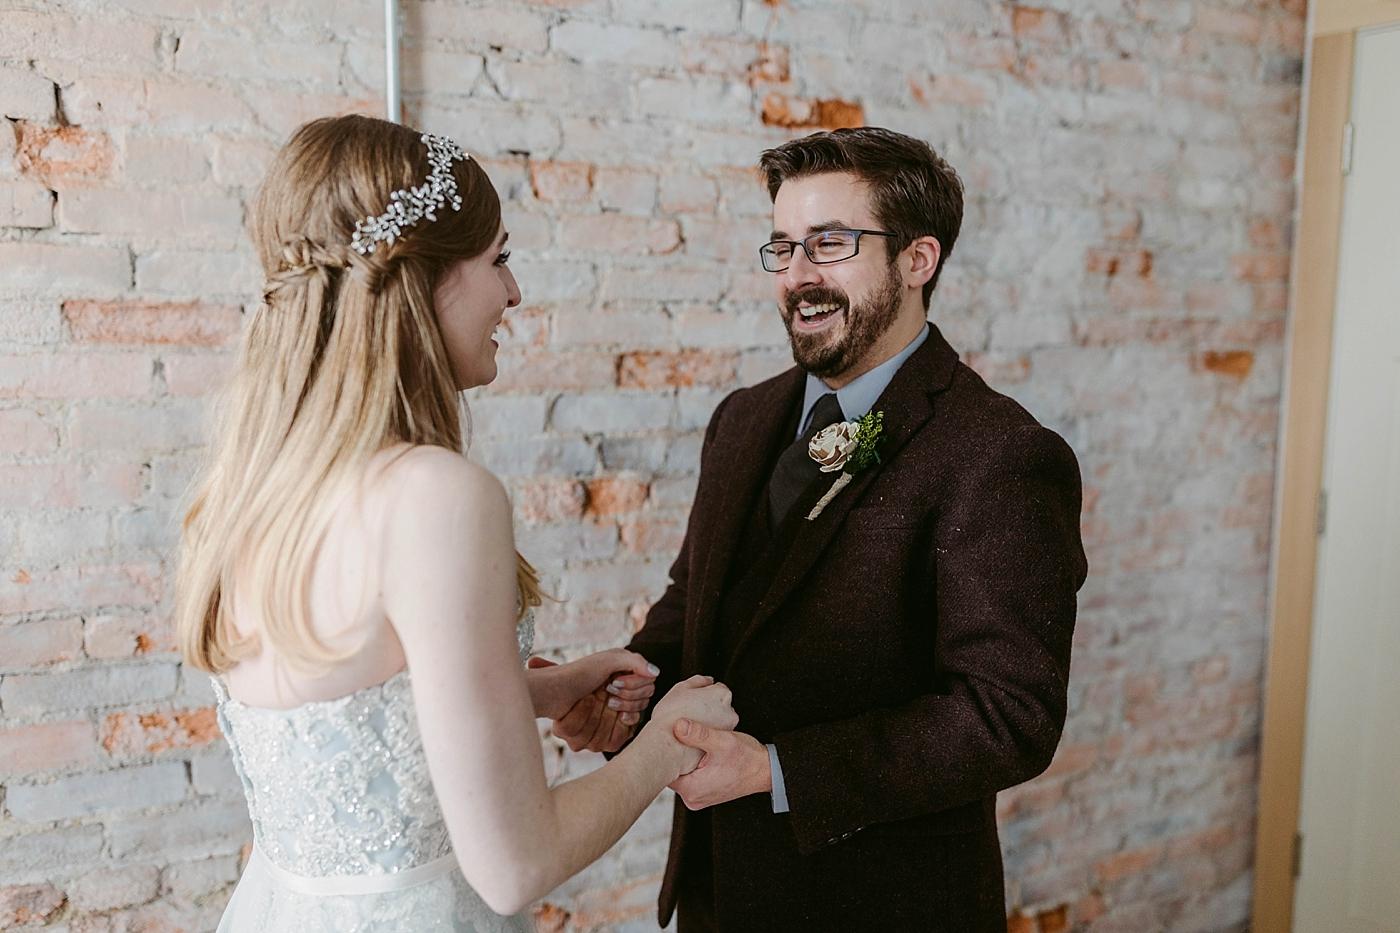 Winter-Squires-Castle-Wedding-James+Jessica_MJPHOTO2017-161.jpg